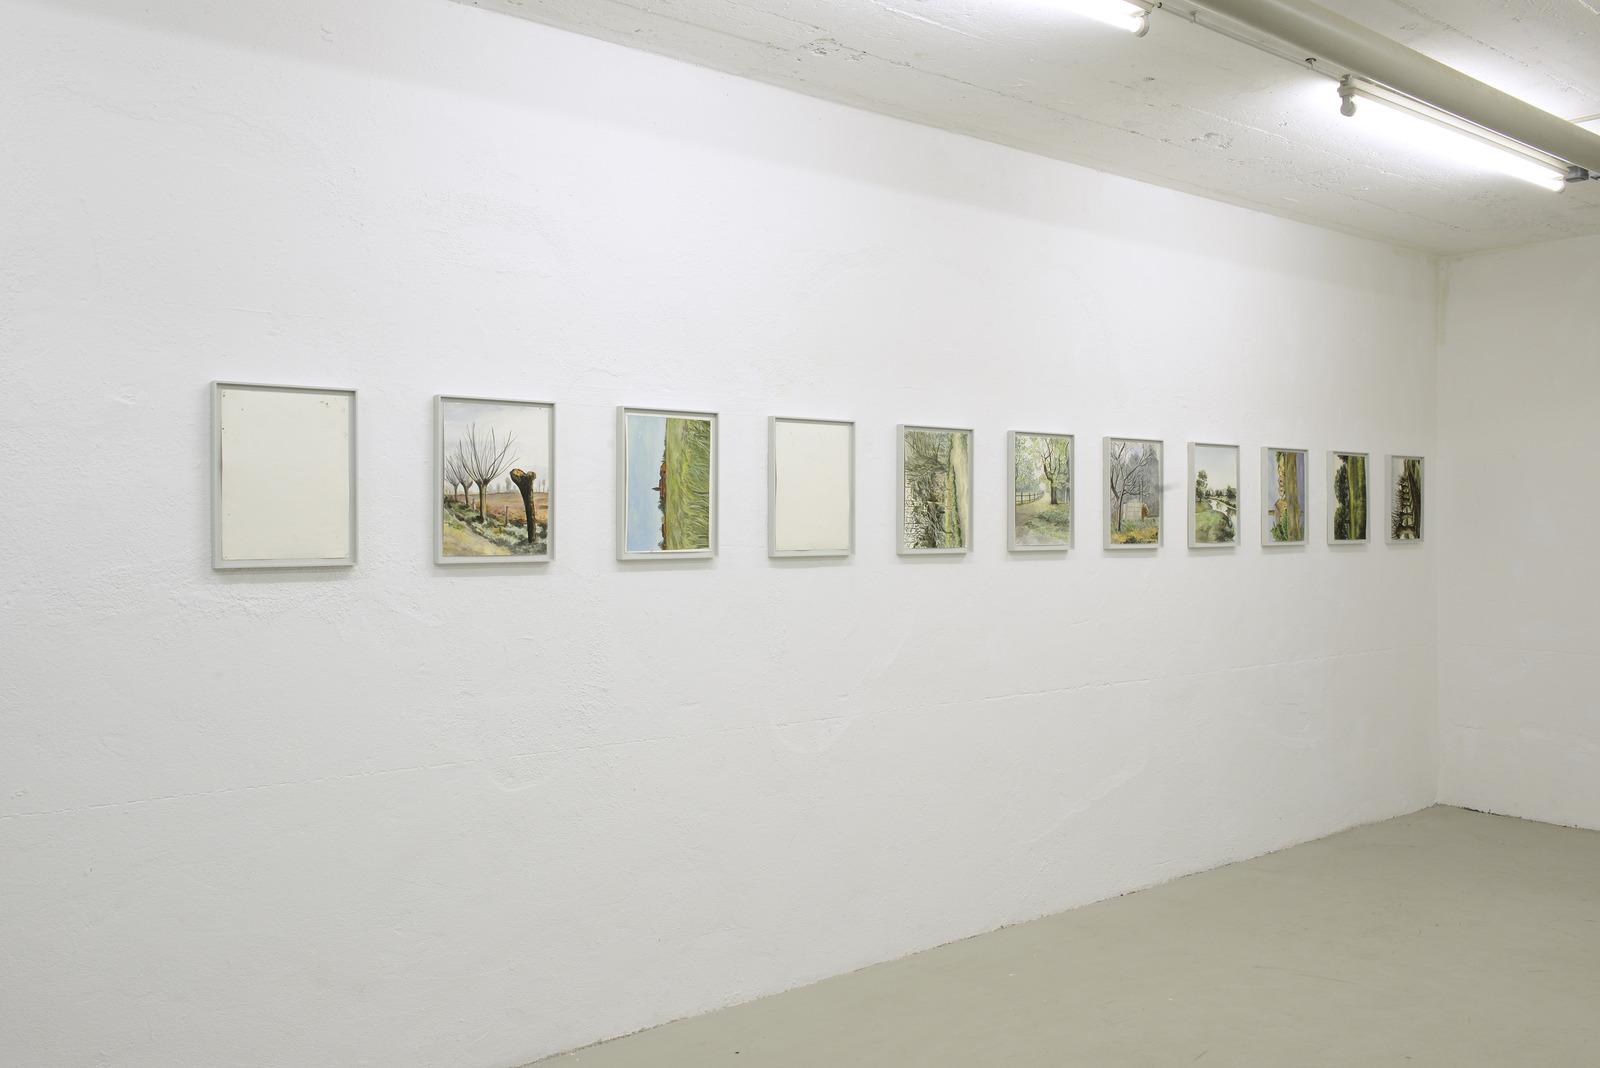 Leen Voet, Kunstbunker 14